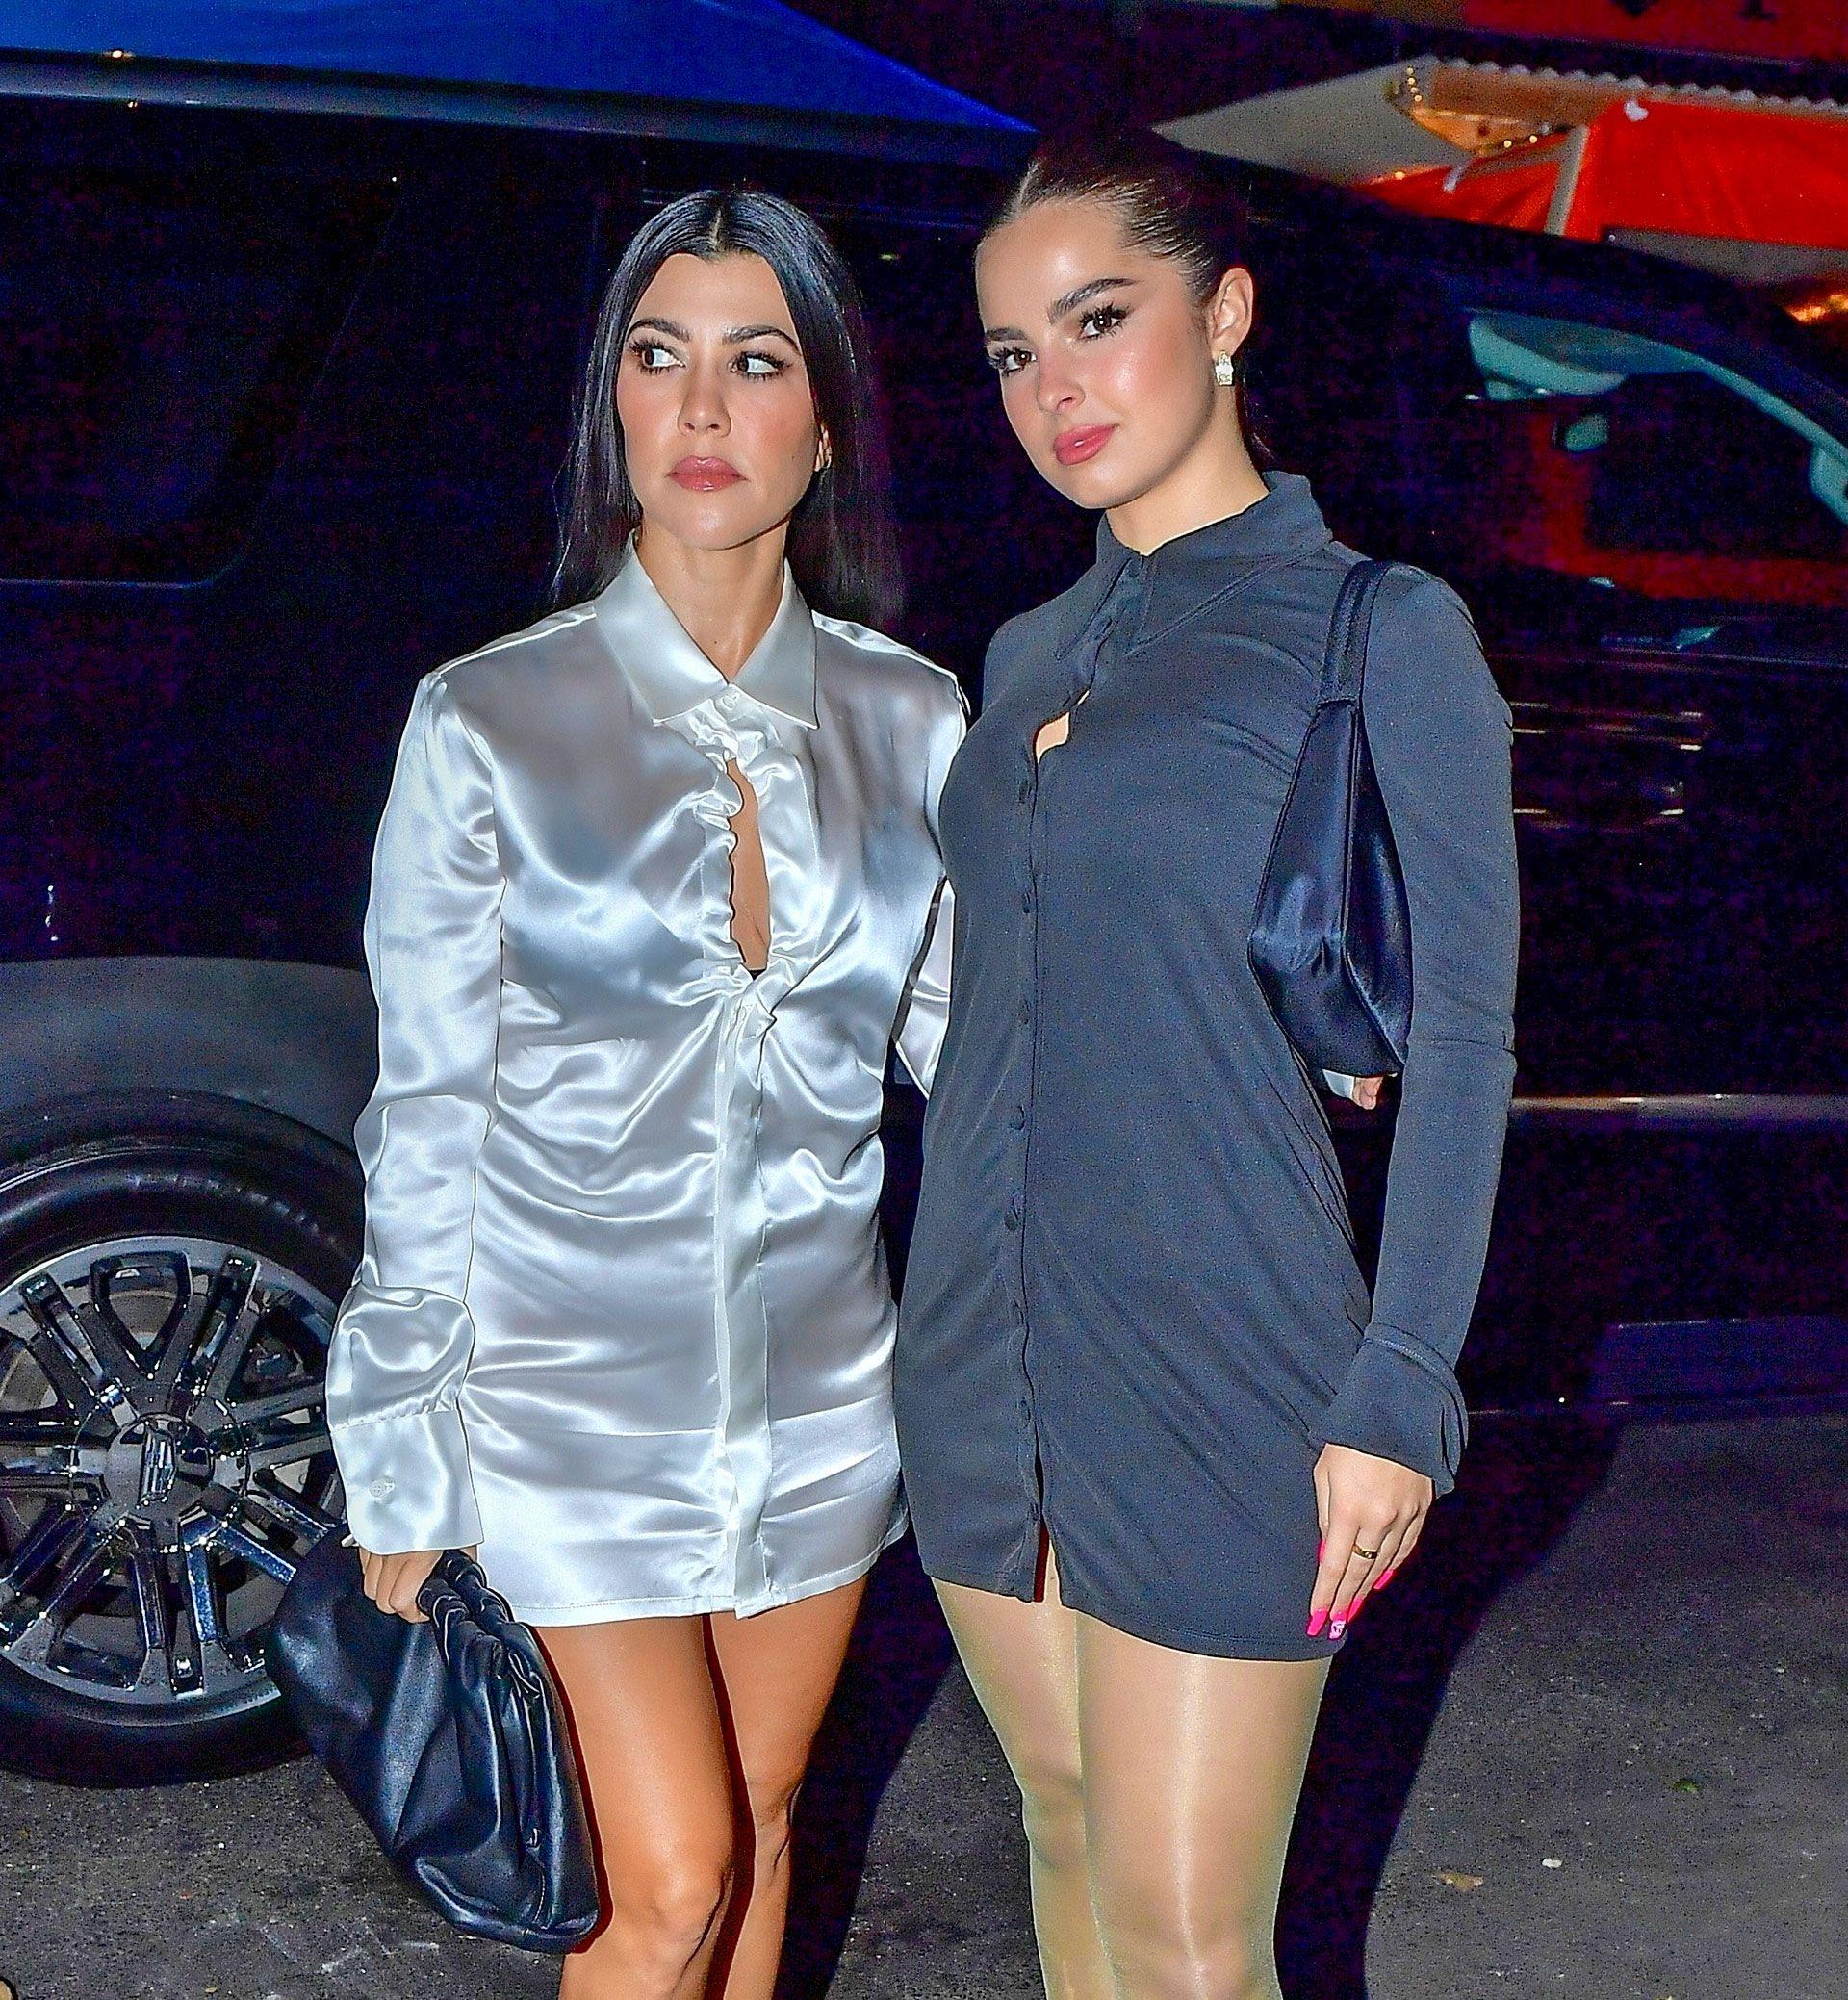 Celebrities-en-un-clic-Kourtney-Kardashian-Addison-Rae-14102020